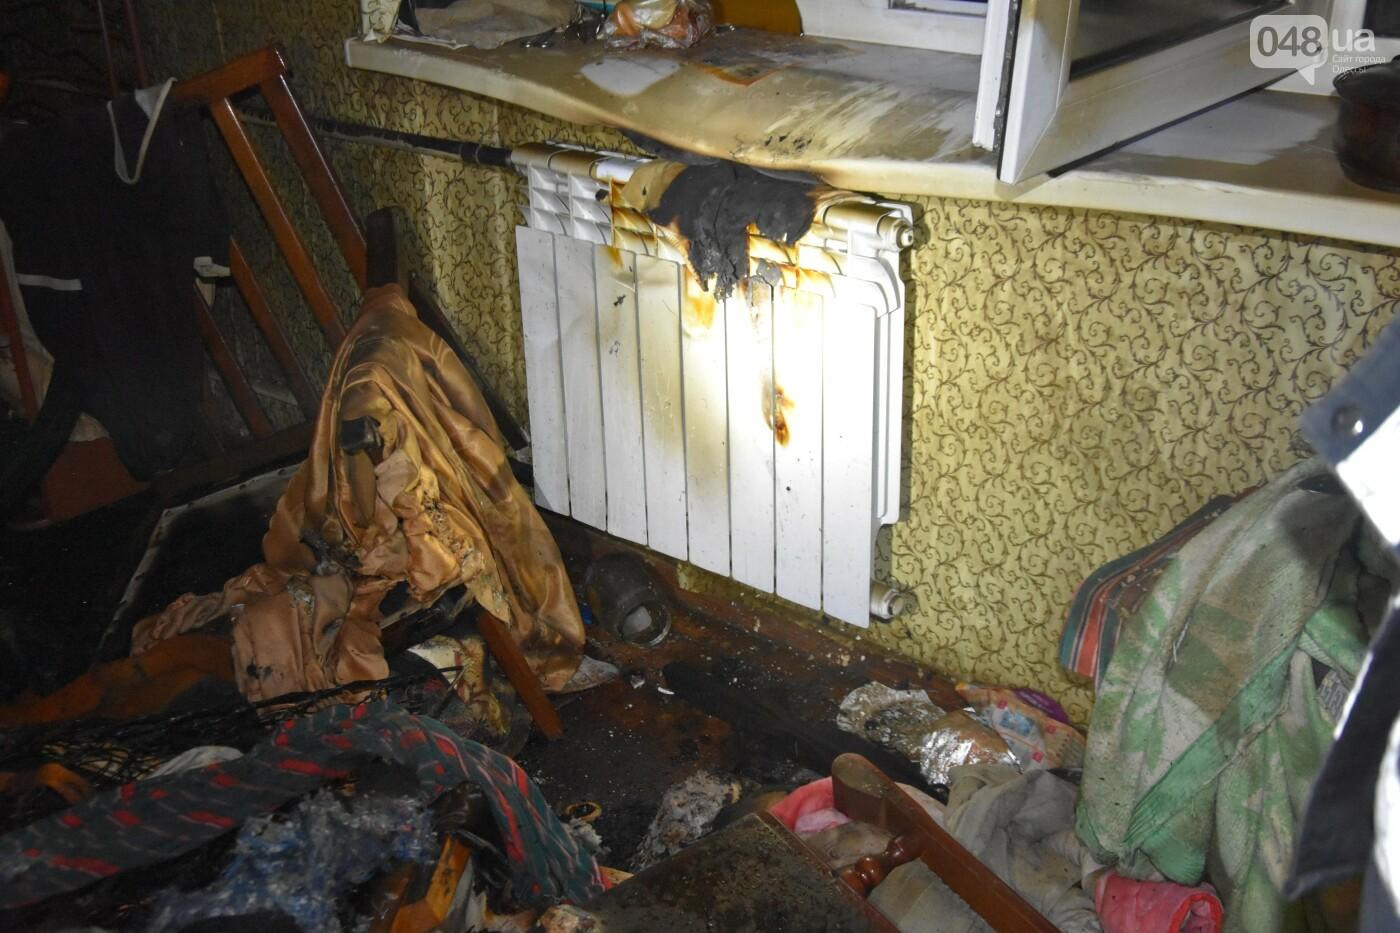 В Одессе в сгоревшей квартире обнаружили тело хозяина, - ФОТО, фото-2